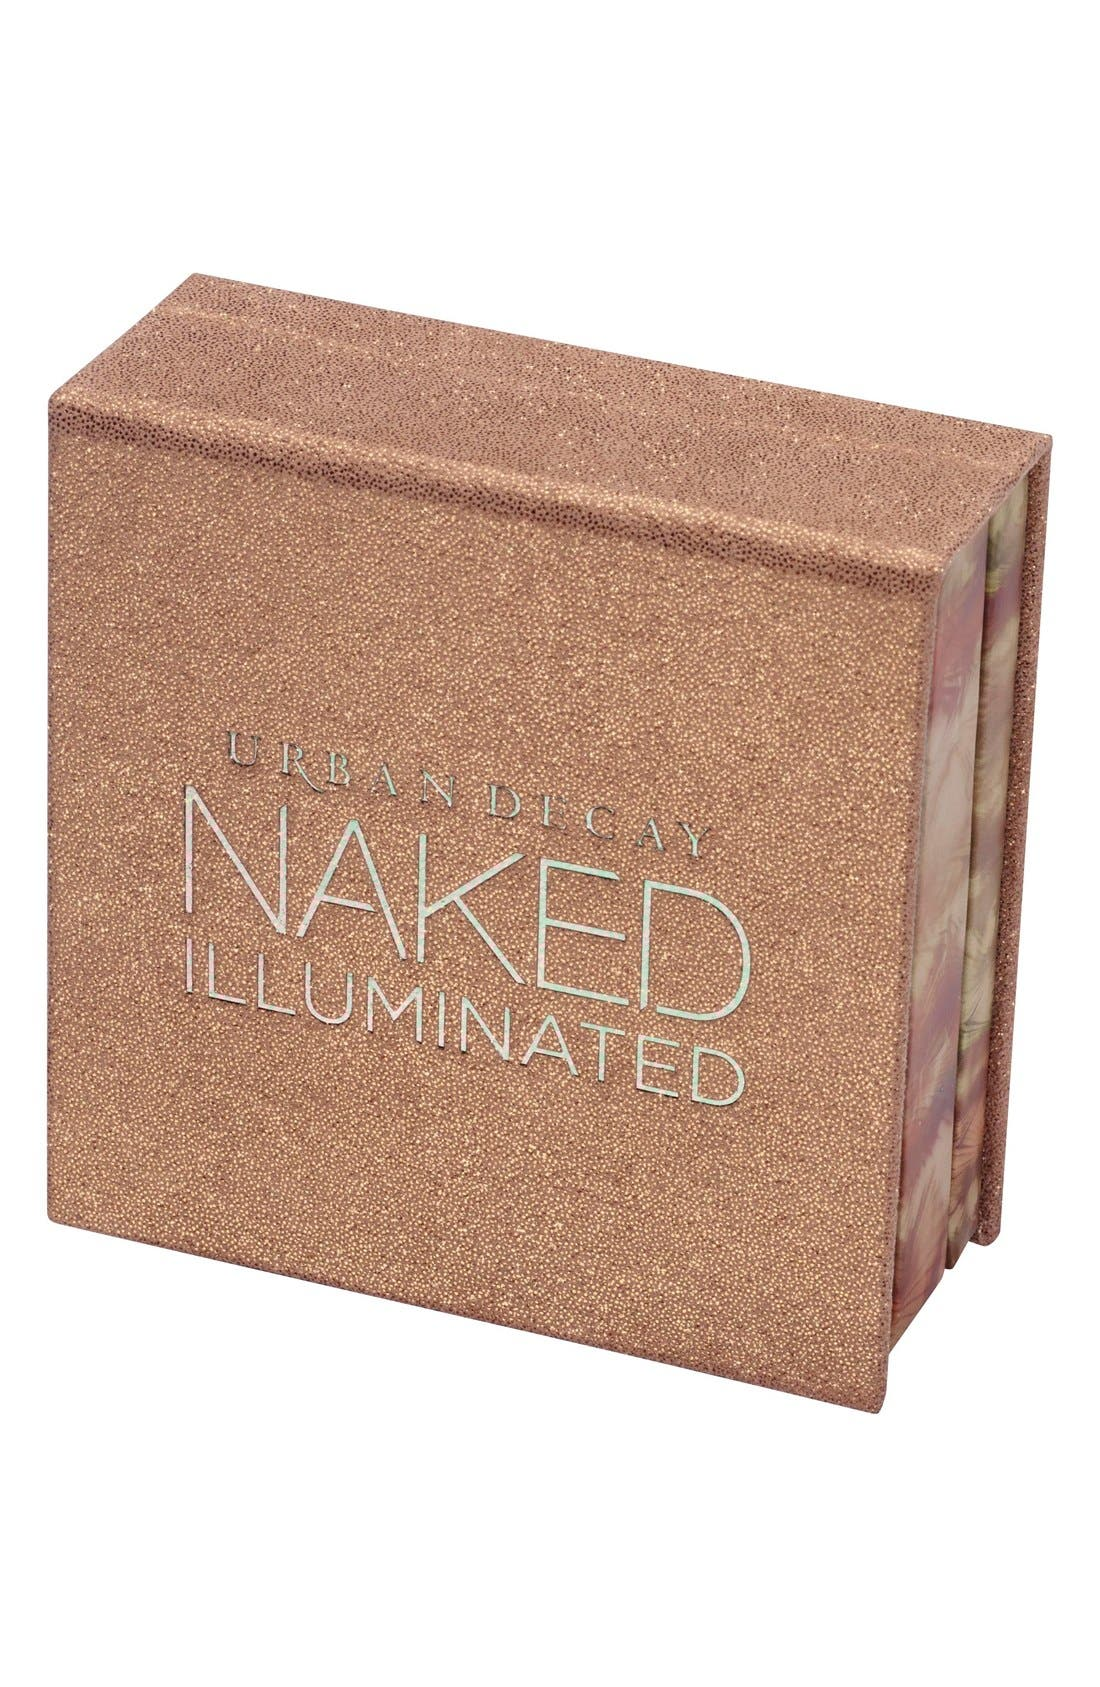 Naked Illuminated Shimmering Powder for Face & Body,                             Alternate thumbnail 3, color,                             220